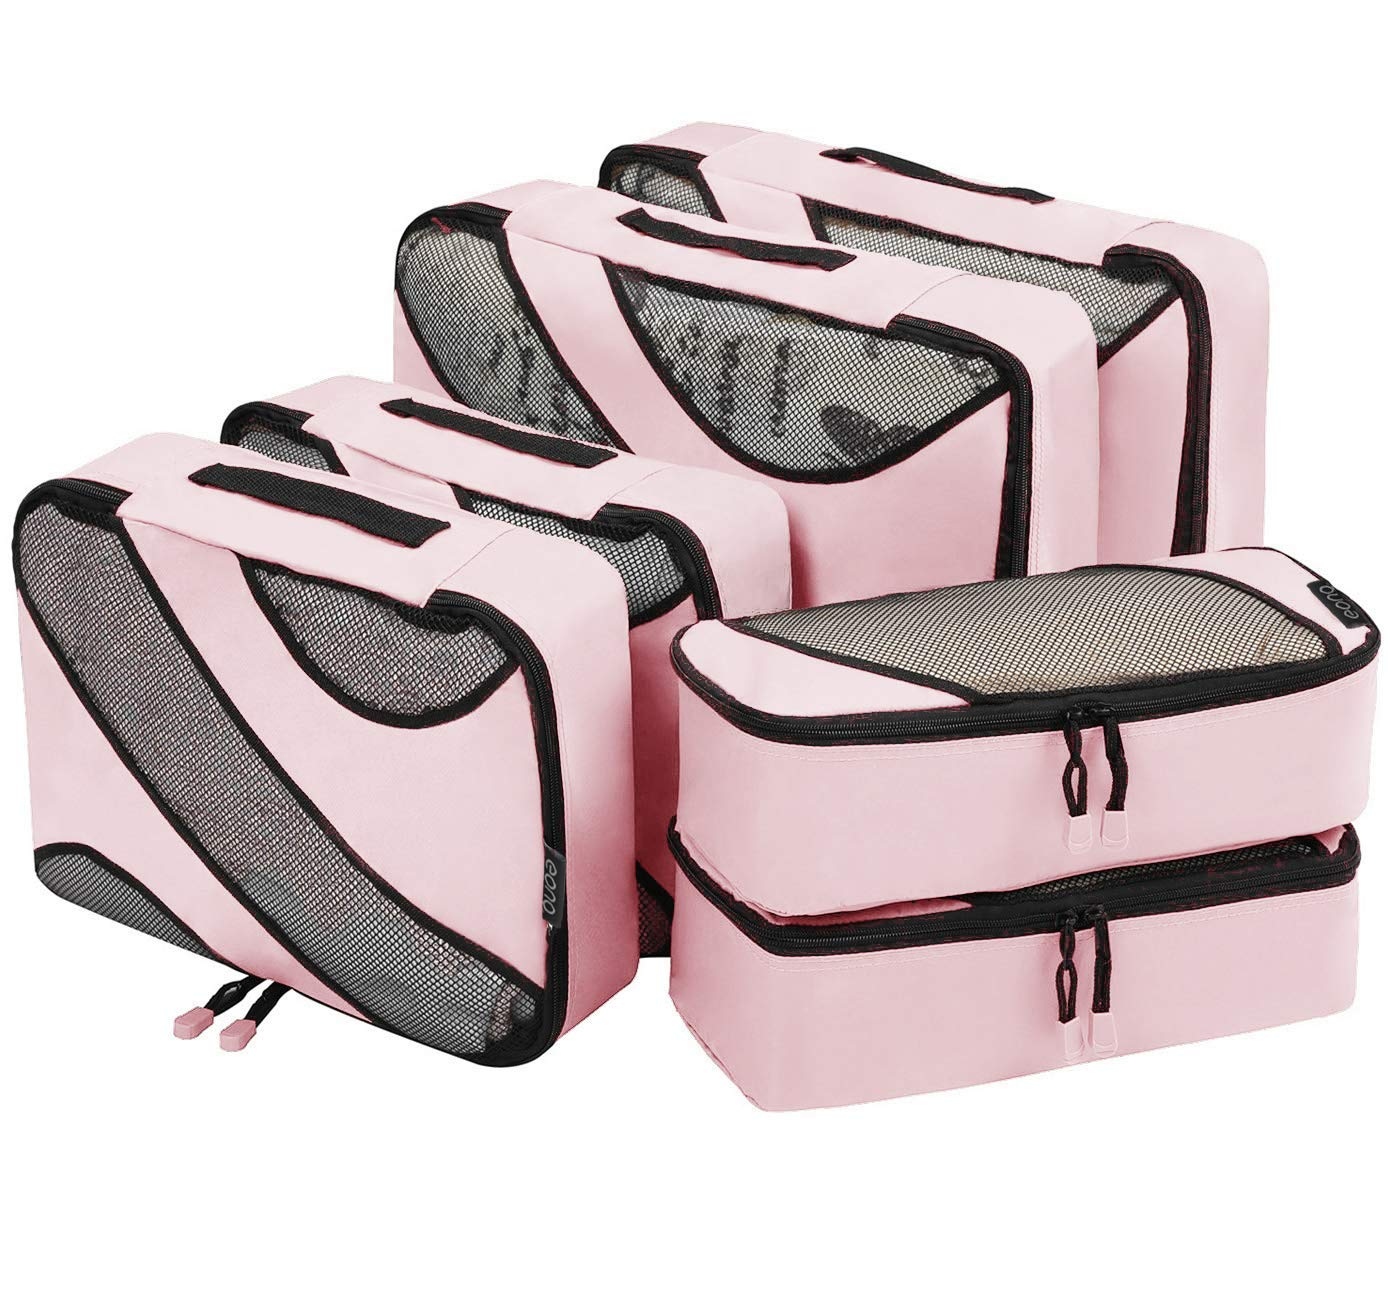 Eono Essentials 6 Set Packing Cubes